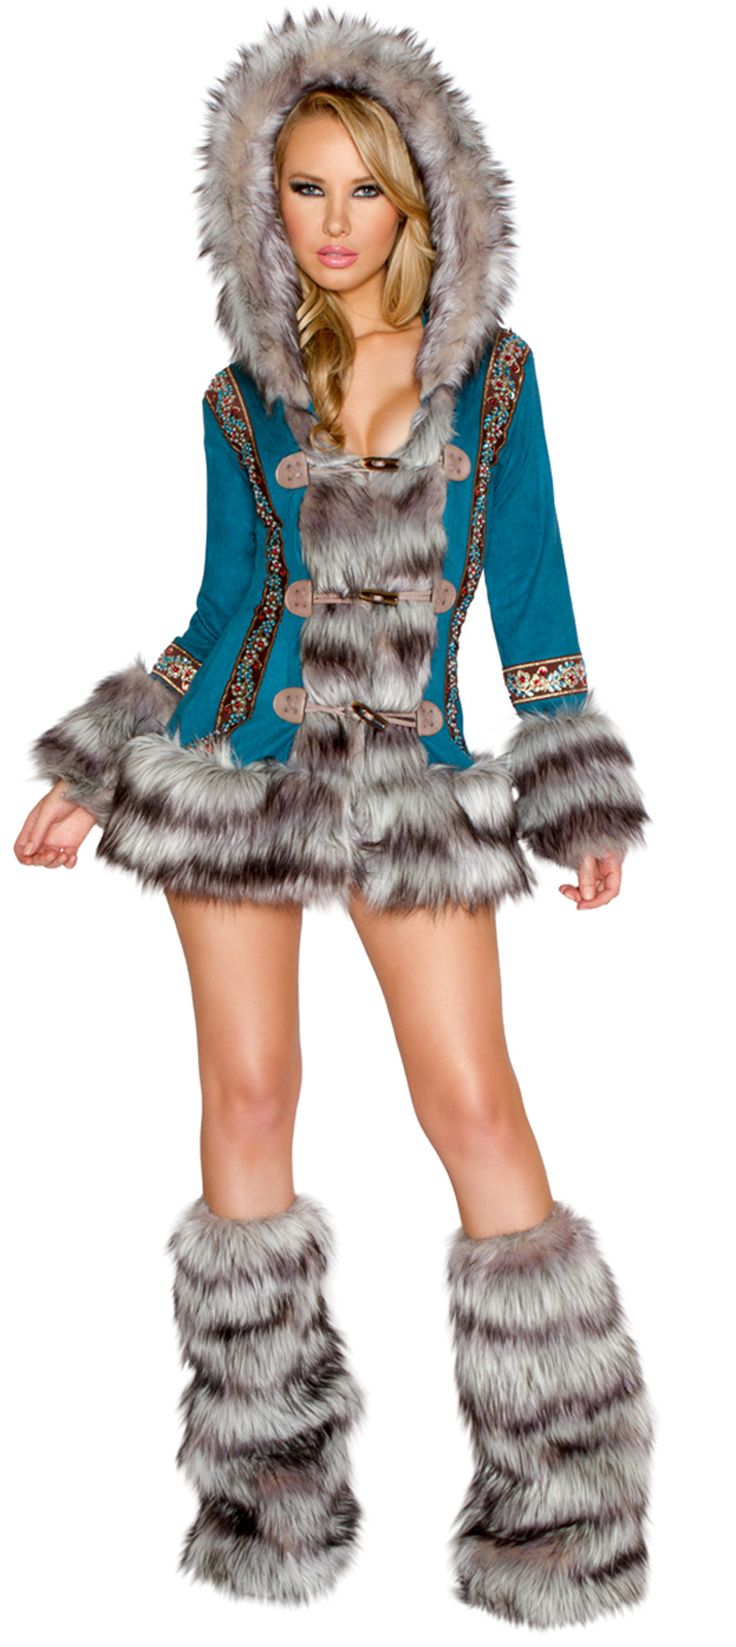 120 Best Faux Fur Halloween Costumes Images On Pinterest